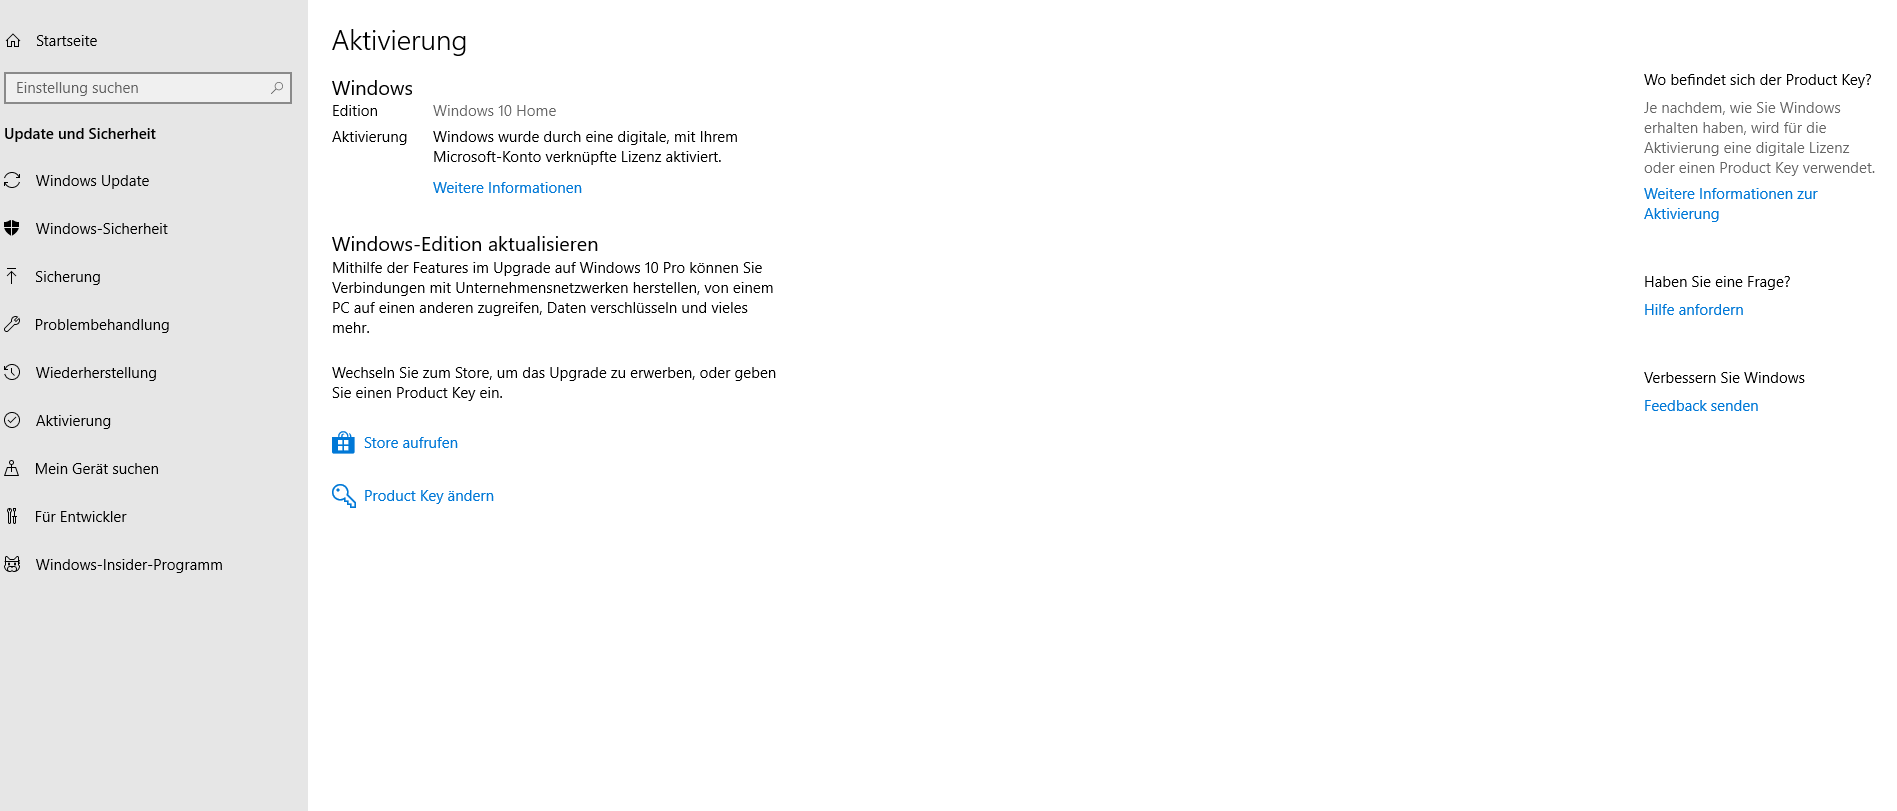 Windows 10 Pro Aktivierungsfehler 0xc004f050